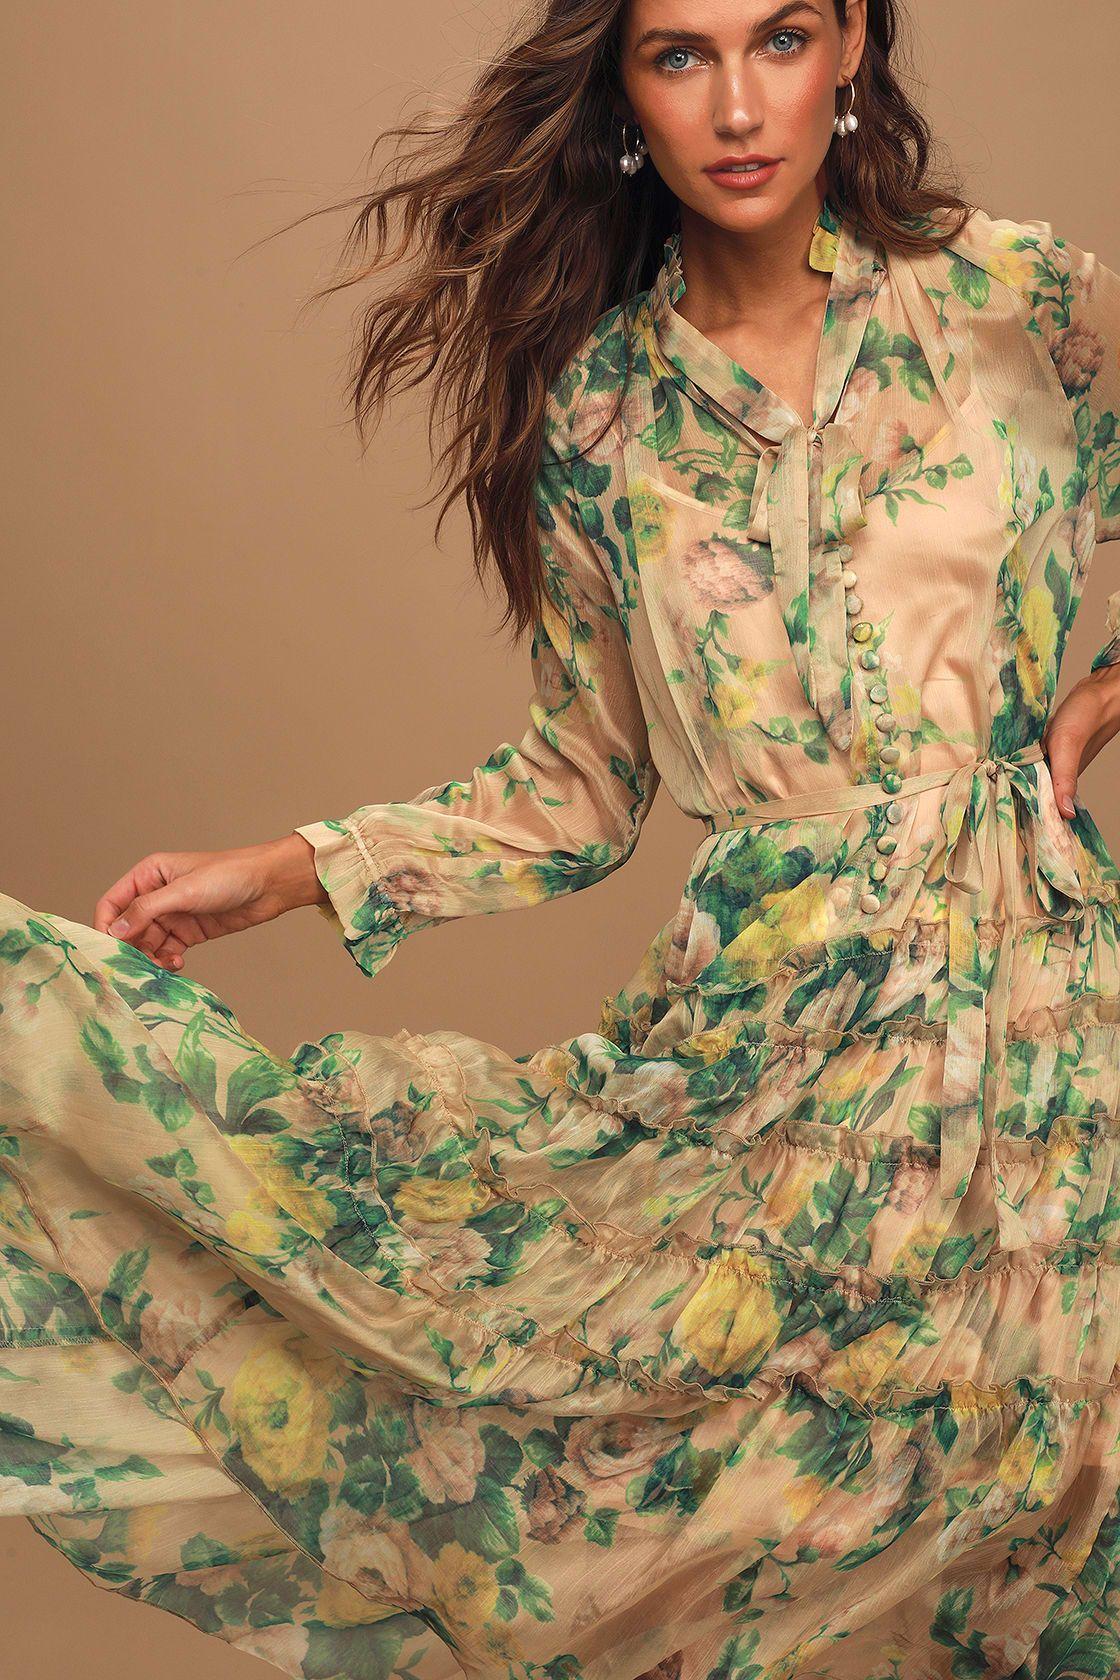 Cosmia Beige Floral Print Ruffled Tiered Midi Dress Tiered Midi Dress Womens Dressy Tank Tops Midi Flare Skirt [ 1680 x 1120 Pixel ]